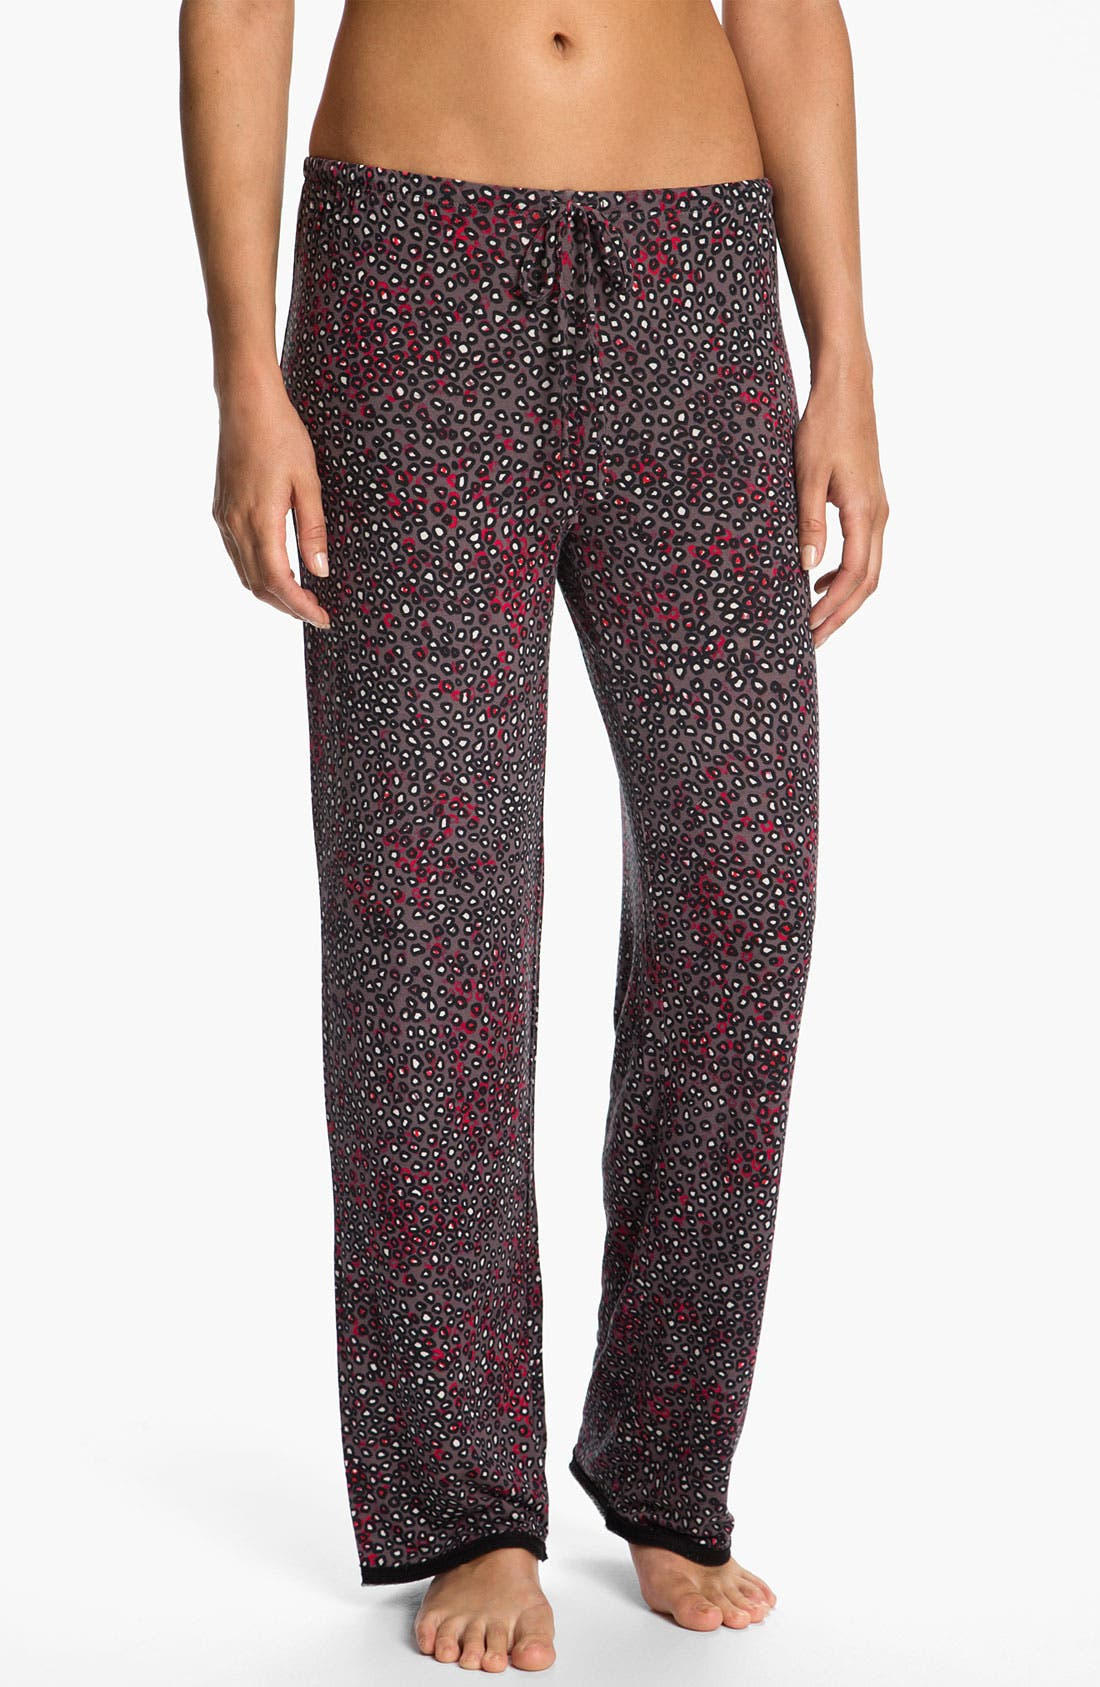 Main Image - DKNY 'Sheer Bliss' Lounge Pants